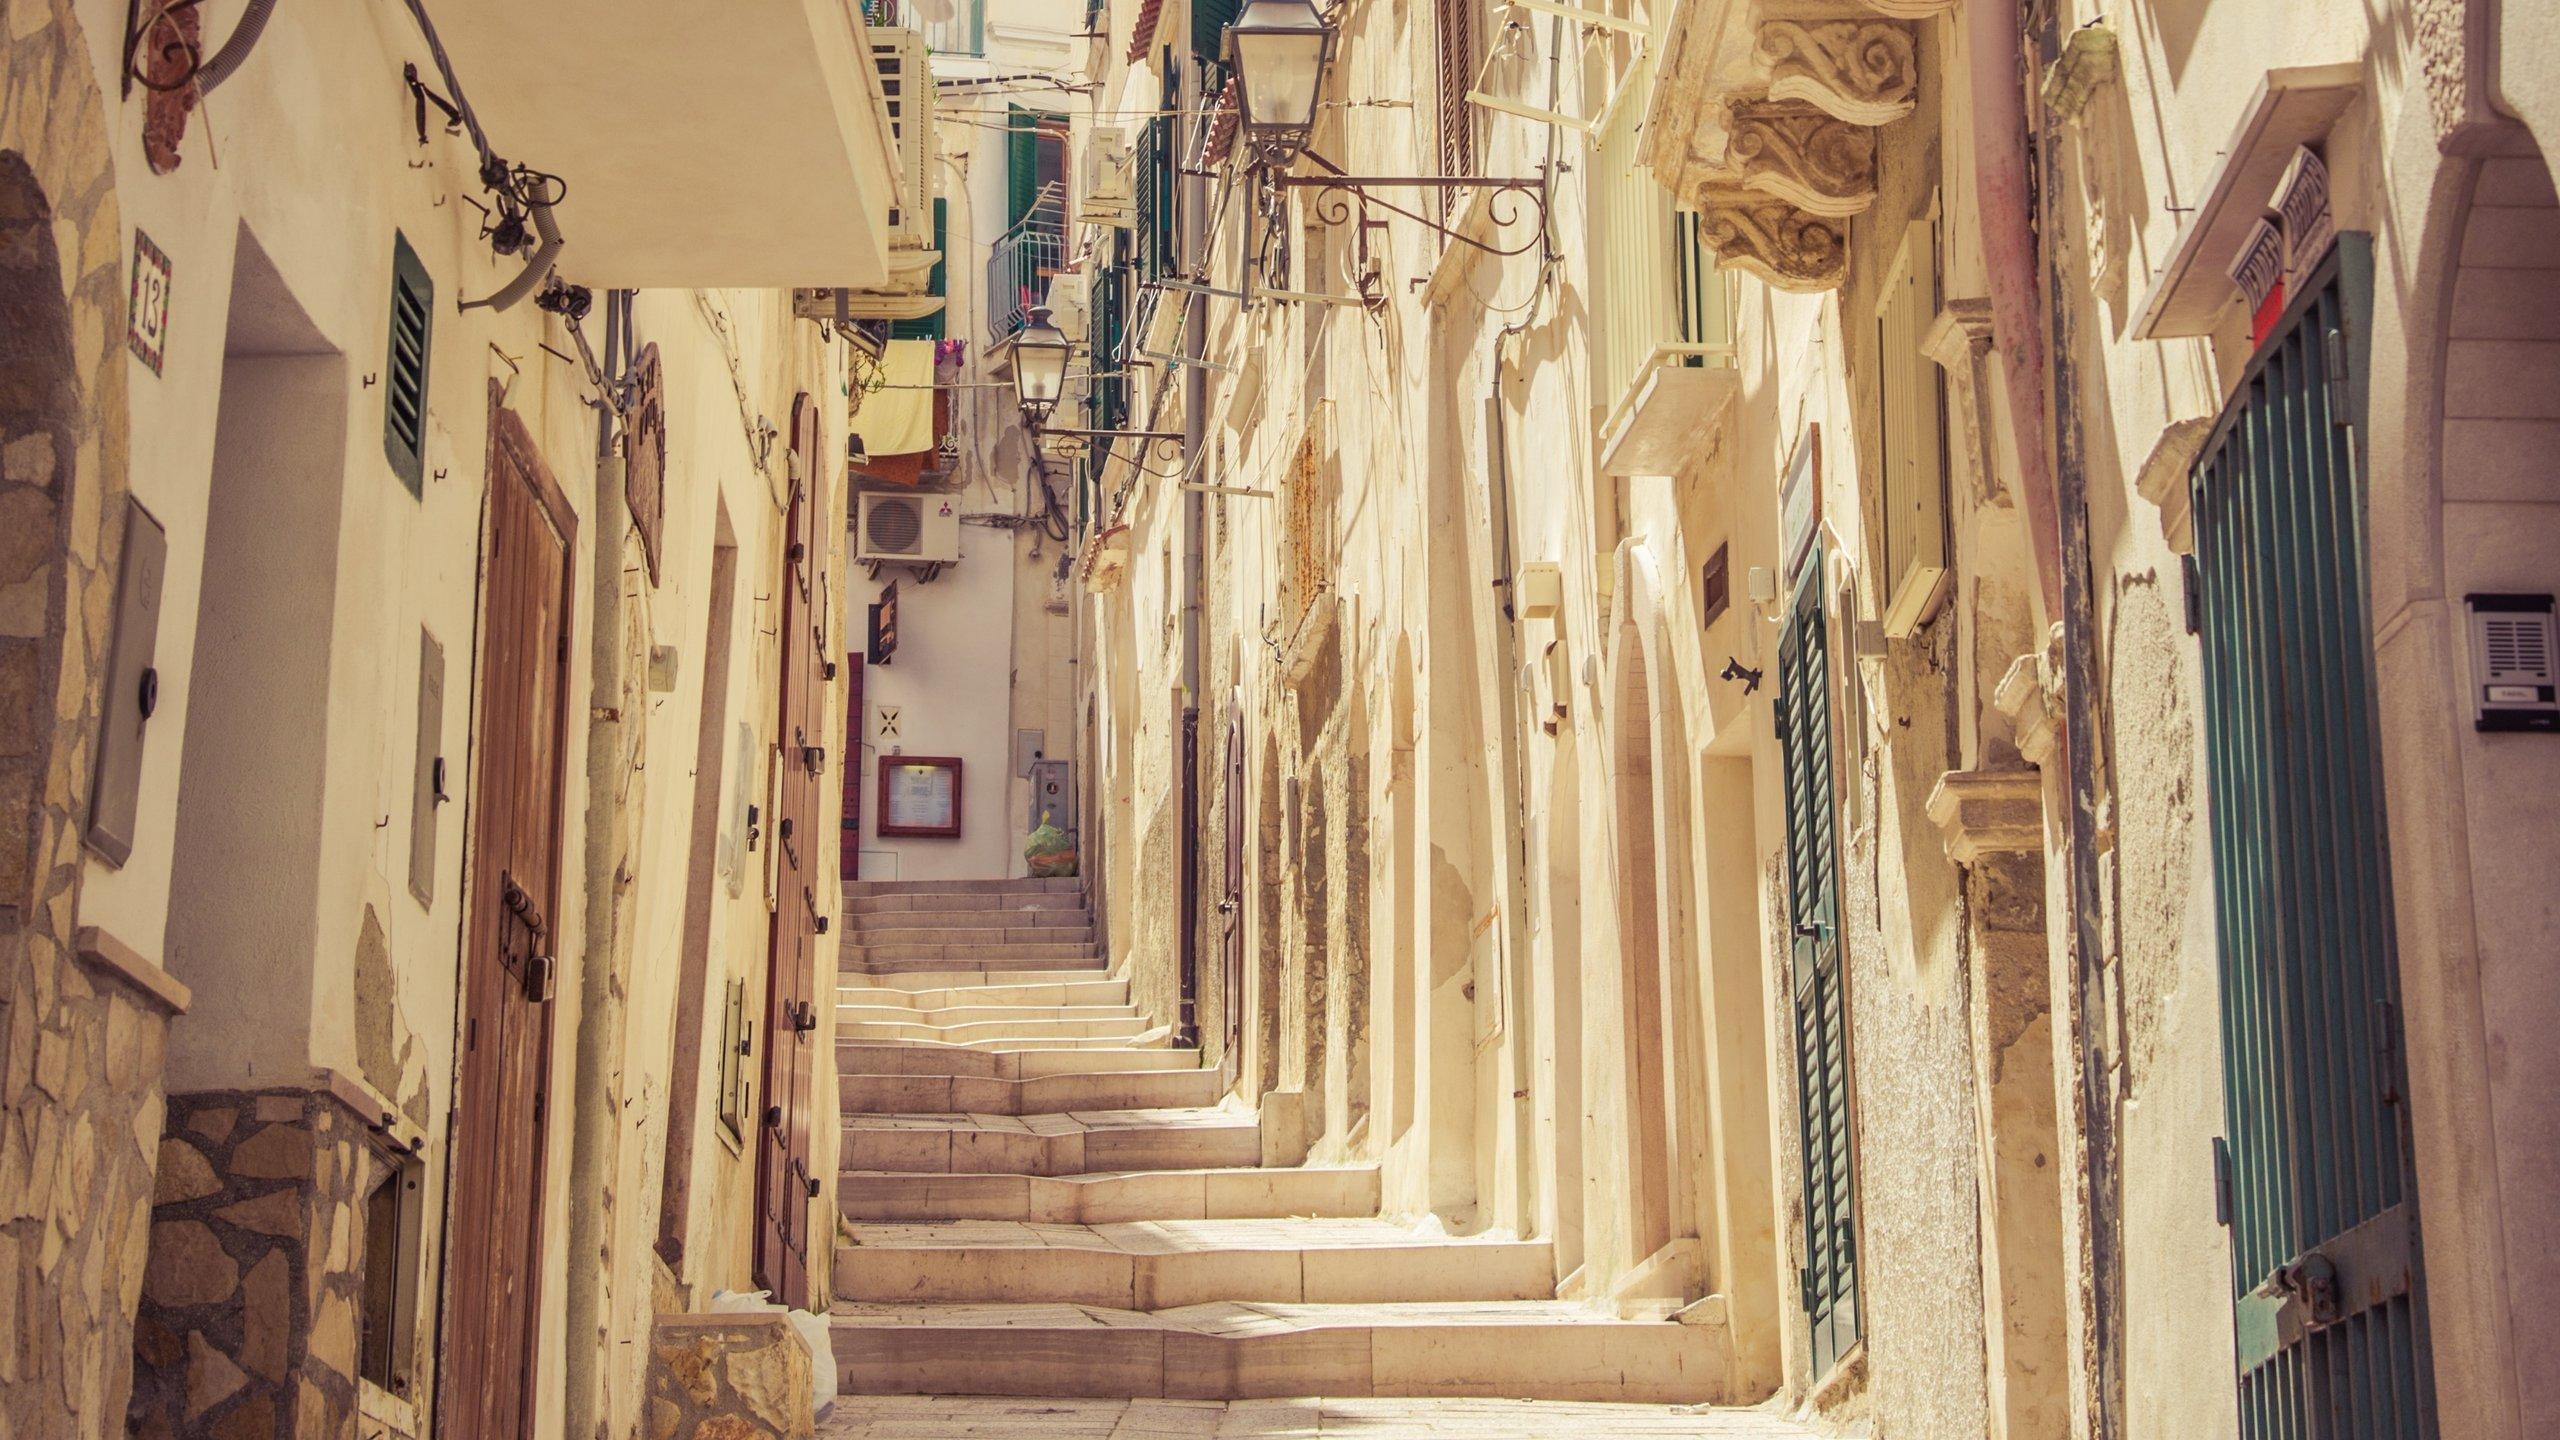 Province of Foggia, Puglia, Italy